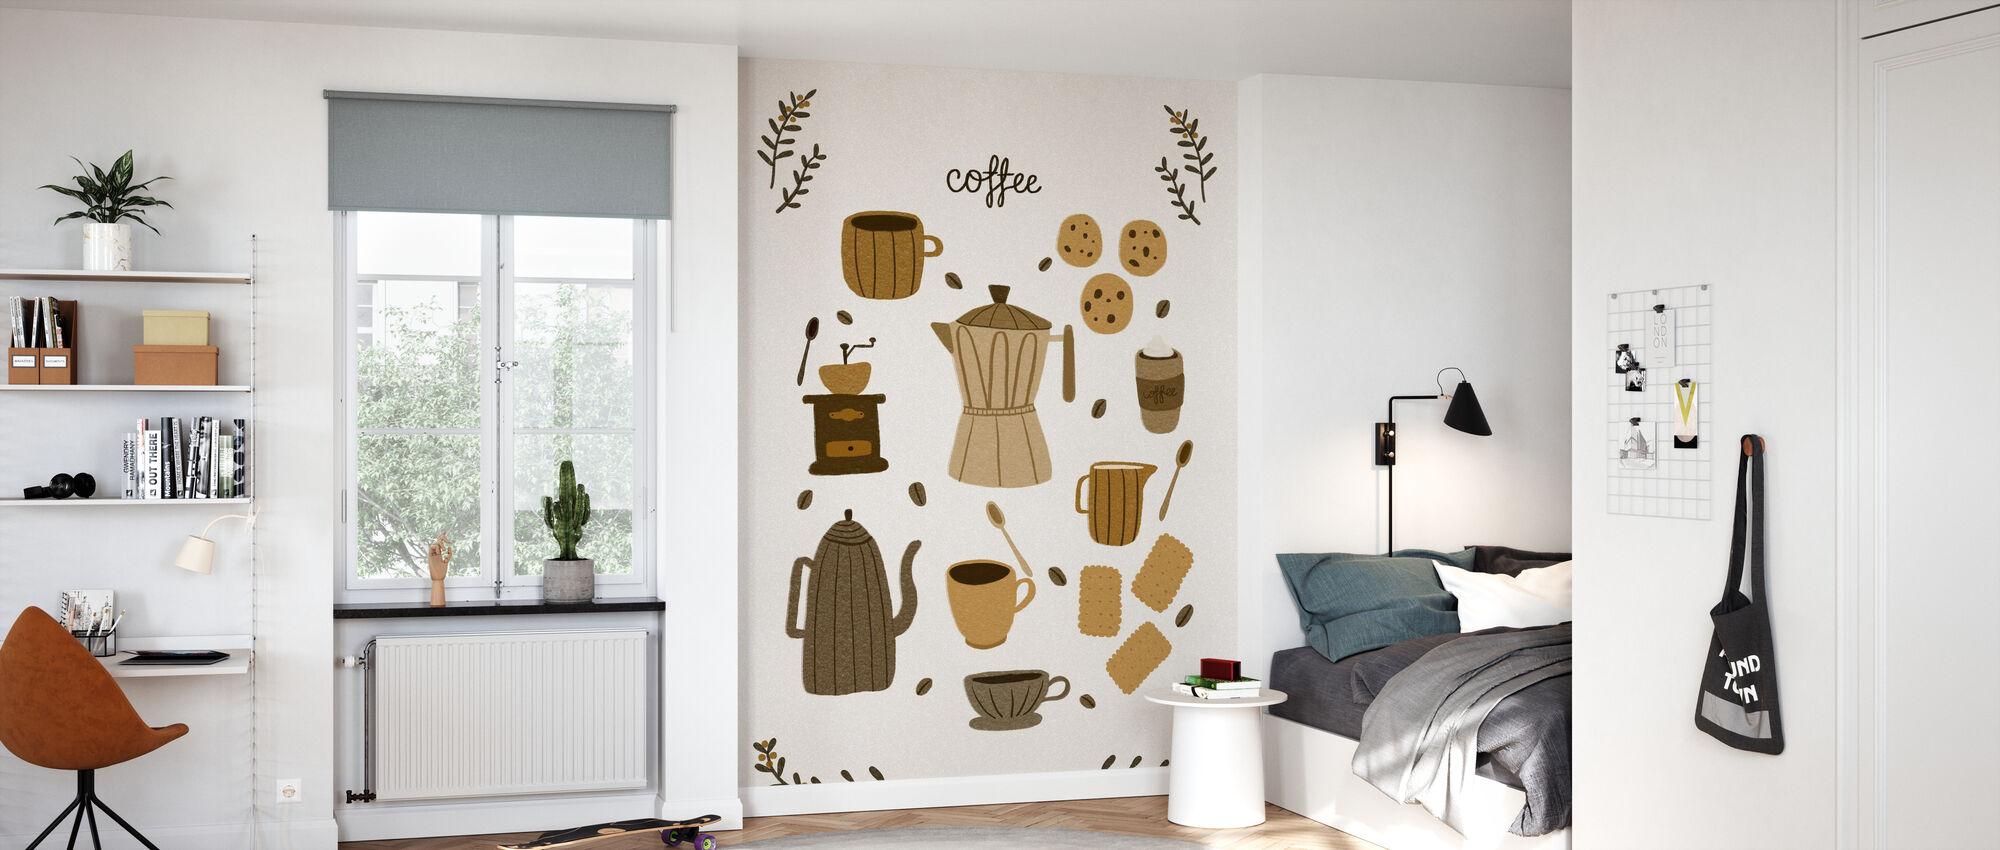 Tid for kaffe - Tapet - Barnerom